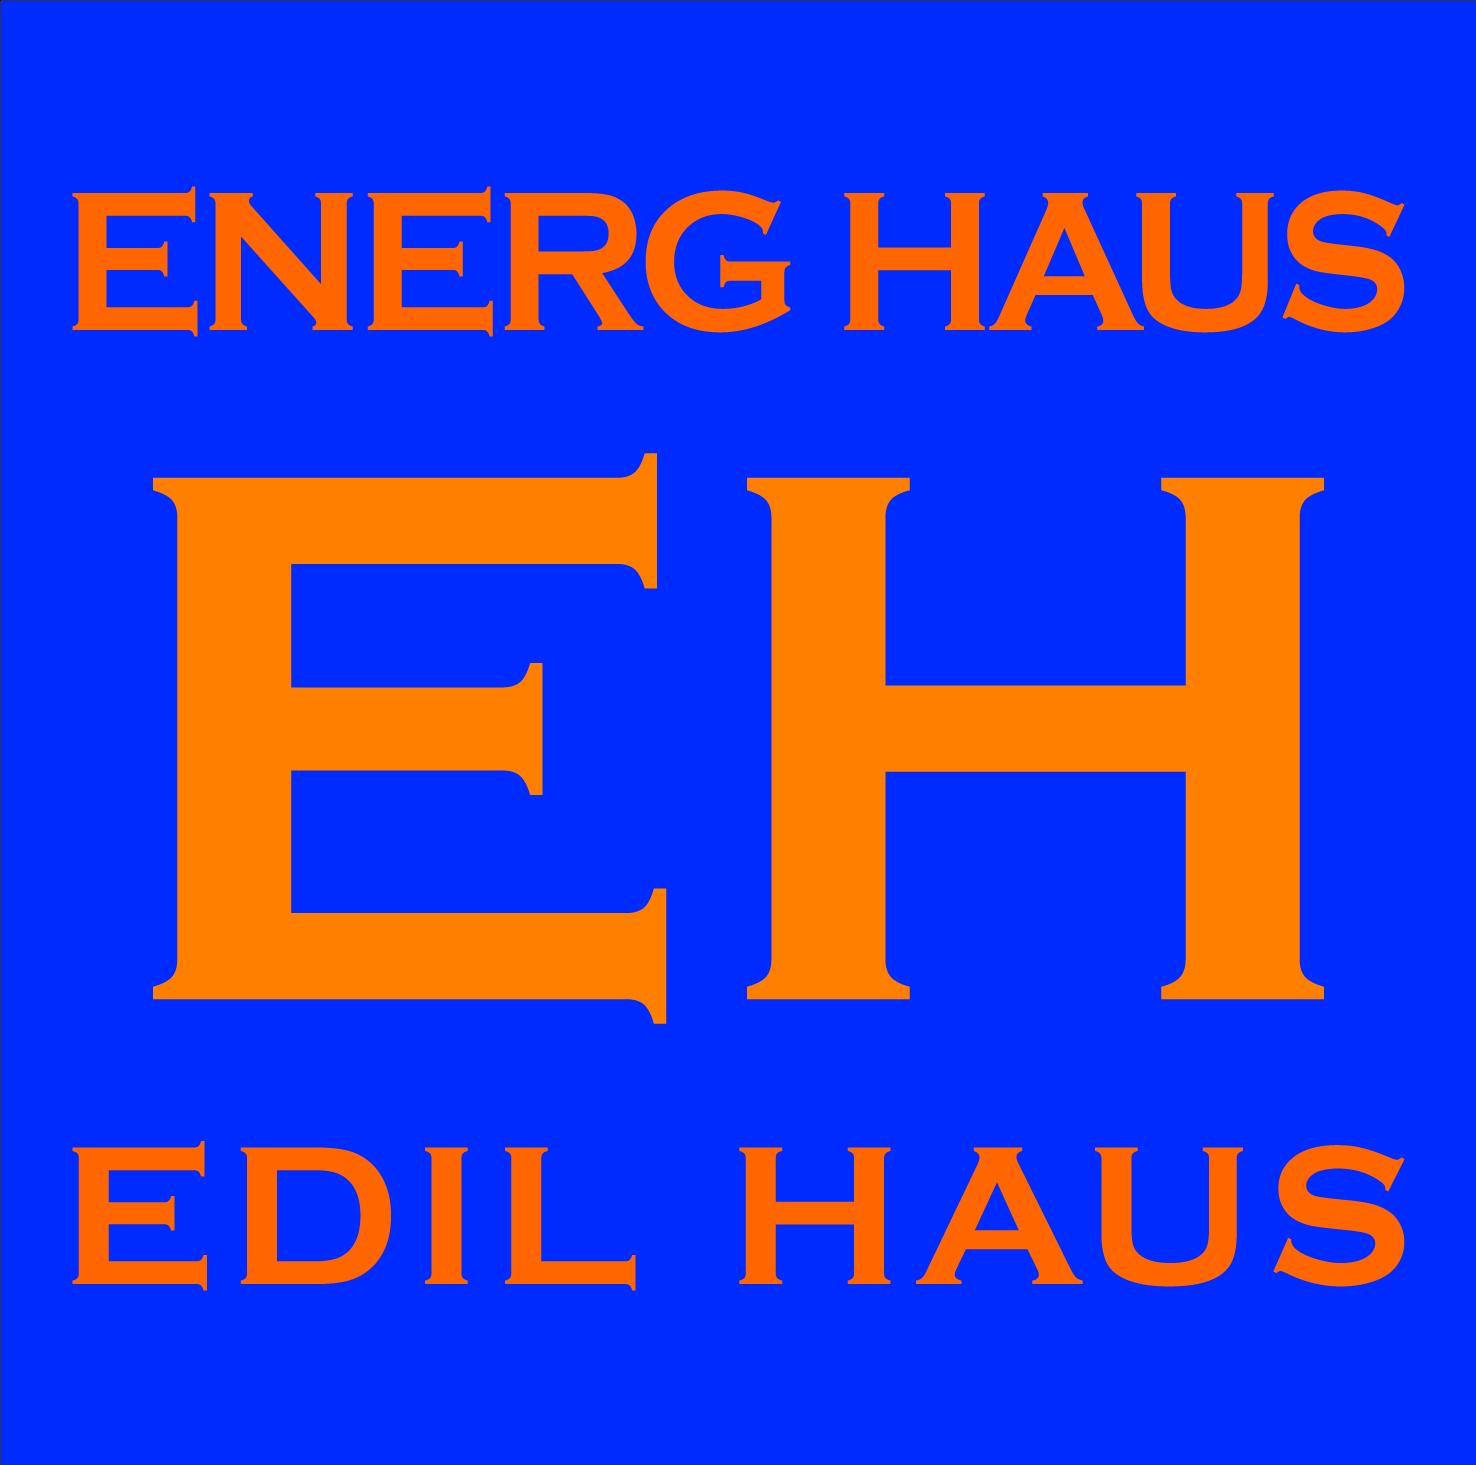 Energ Haus